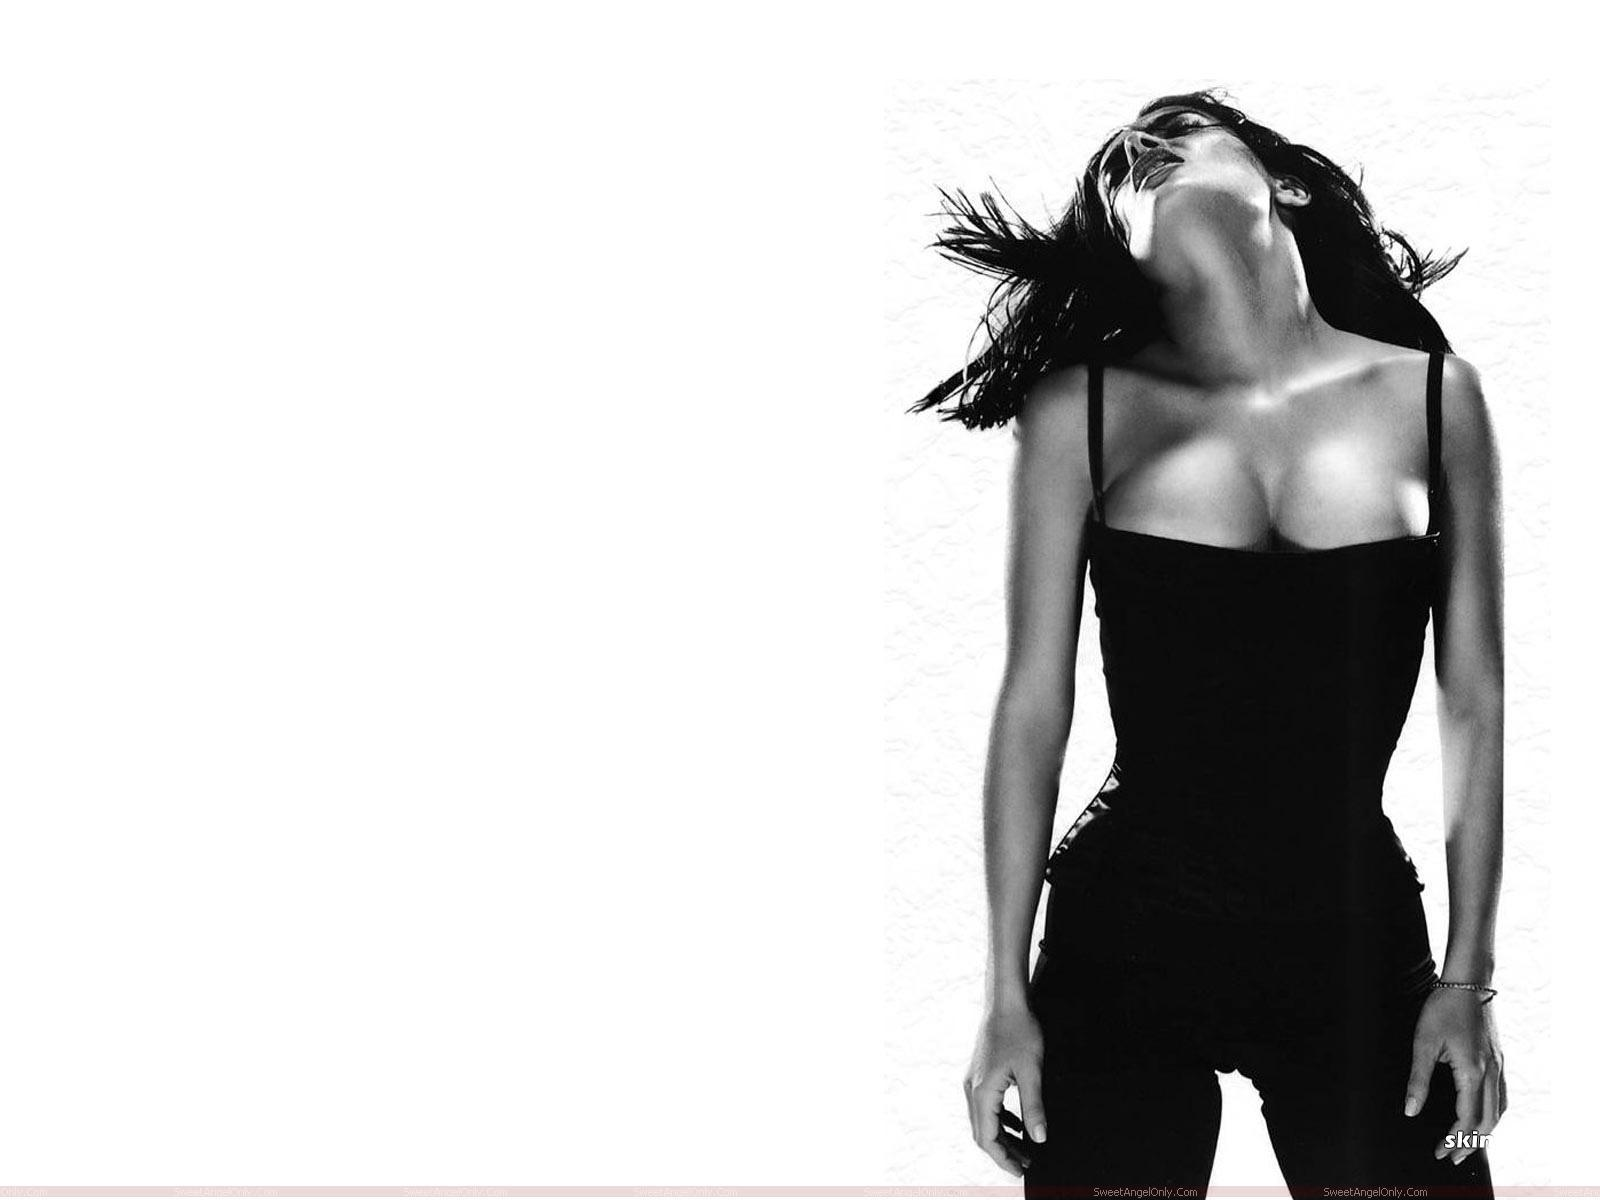 http://4.bp.blogspot.com/-8KkwBHdK_Xc/TbA4taeY5VI/AAAAAAAAG00/vv9xpci_vBc/s1600/salma_hayek_hd_wallpaper_black_n_white.jpg